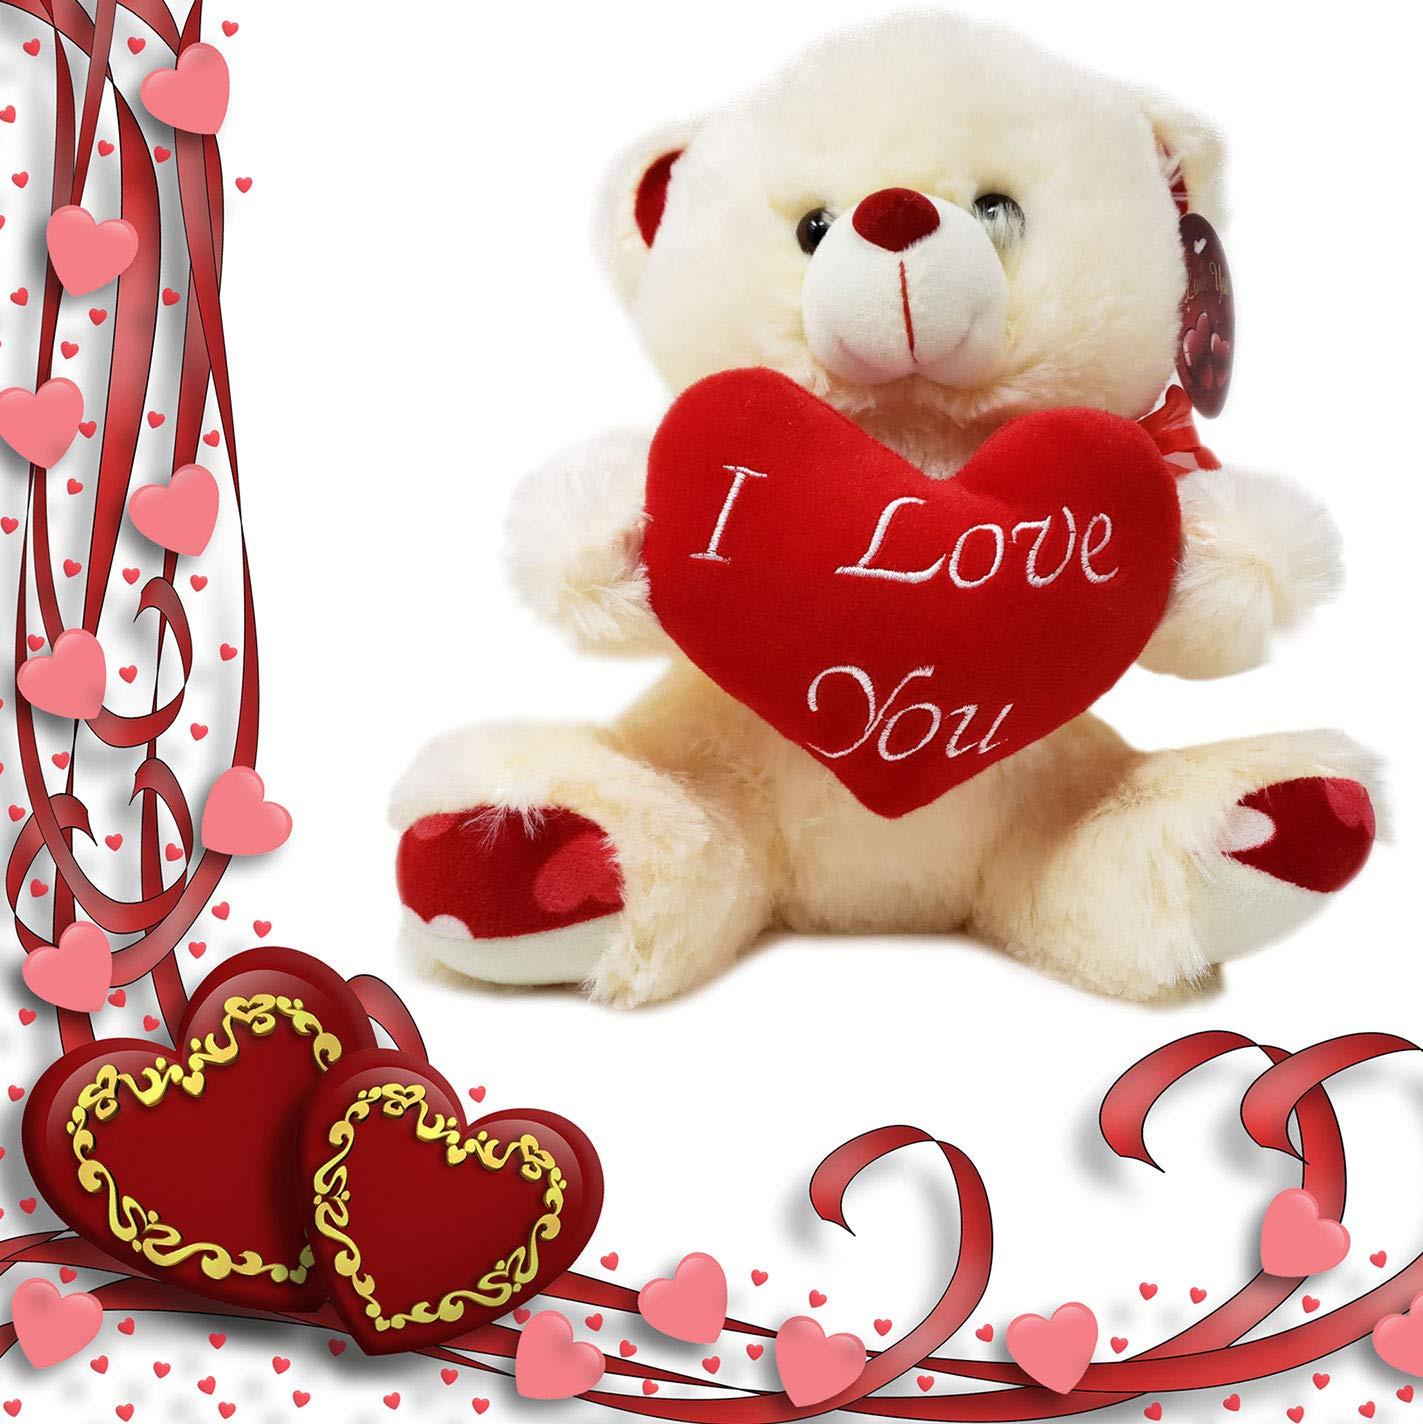 CUTE VALENTINE DAY STUFFED TEDDY BEAR I LOVE YOU PLUSH HEART MUSIC INCLUDED